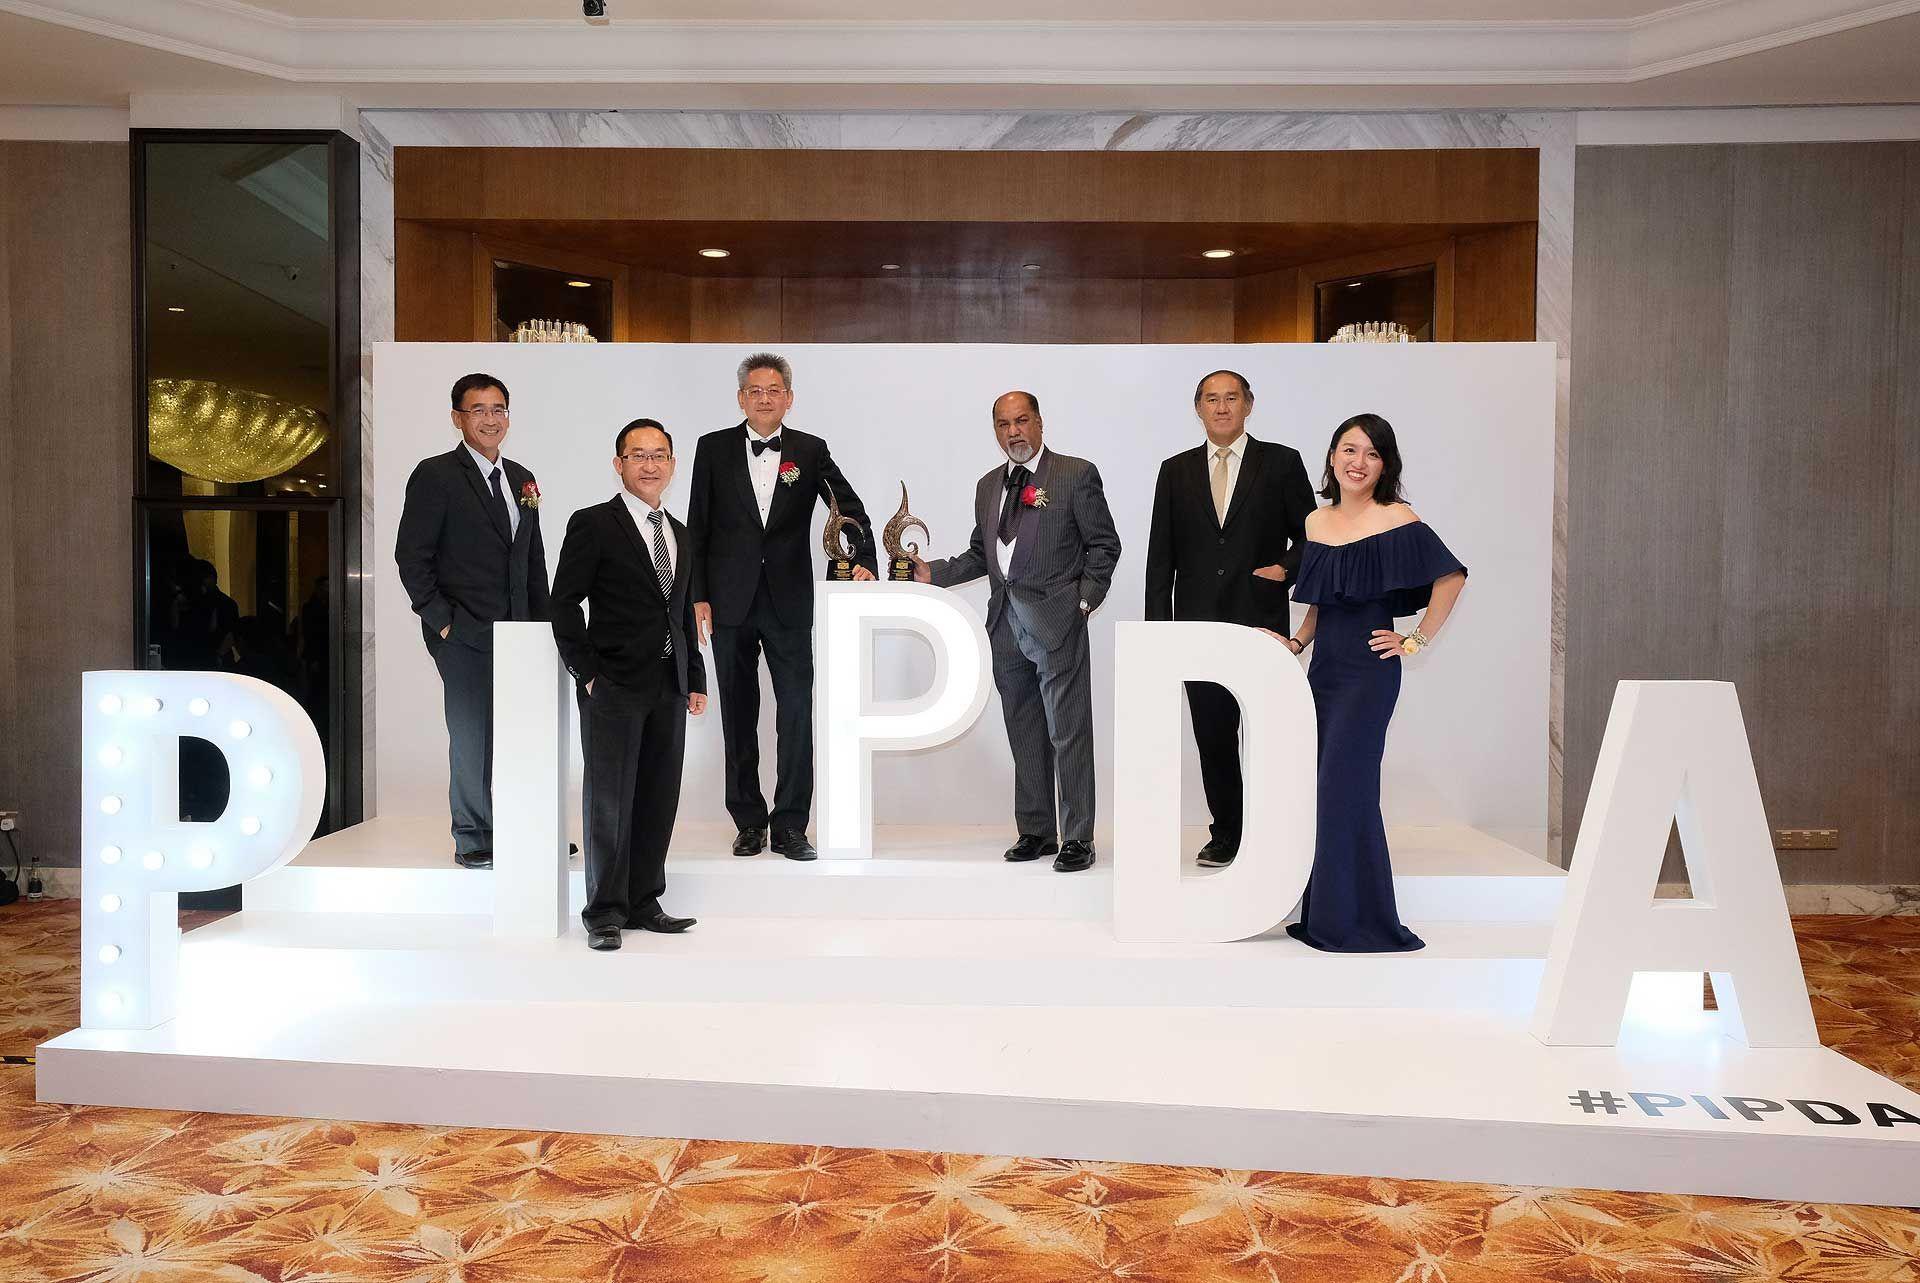 Leong Jee Van, Pak Heng Cheong, Ho Kong Soon, Dato' N Logendran, Tan Seng Heng and Tan Sze Chee